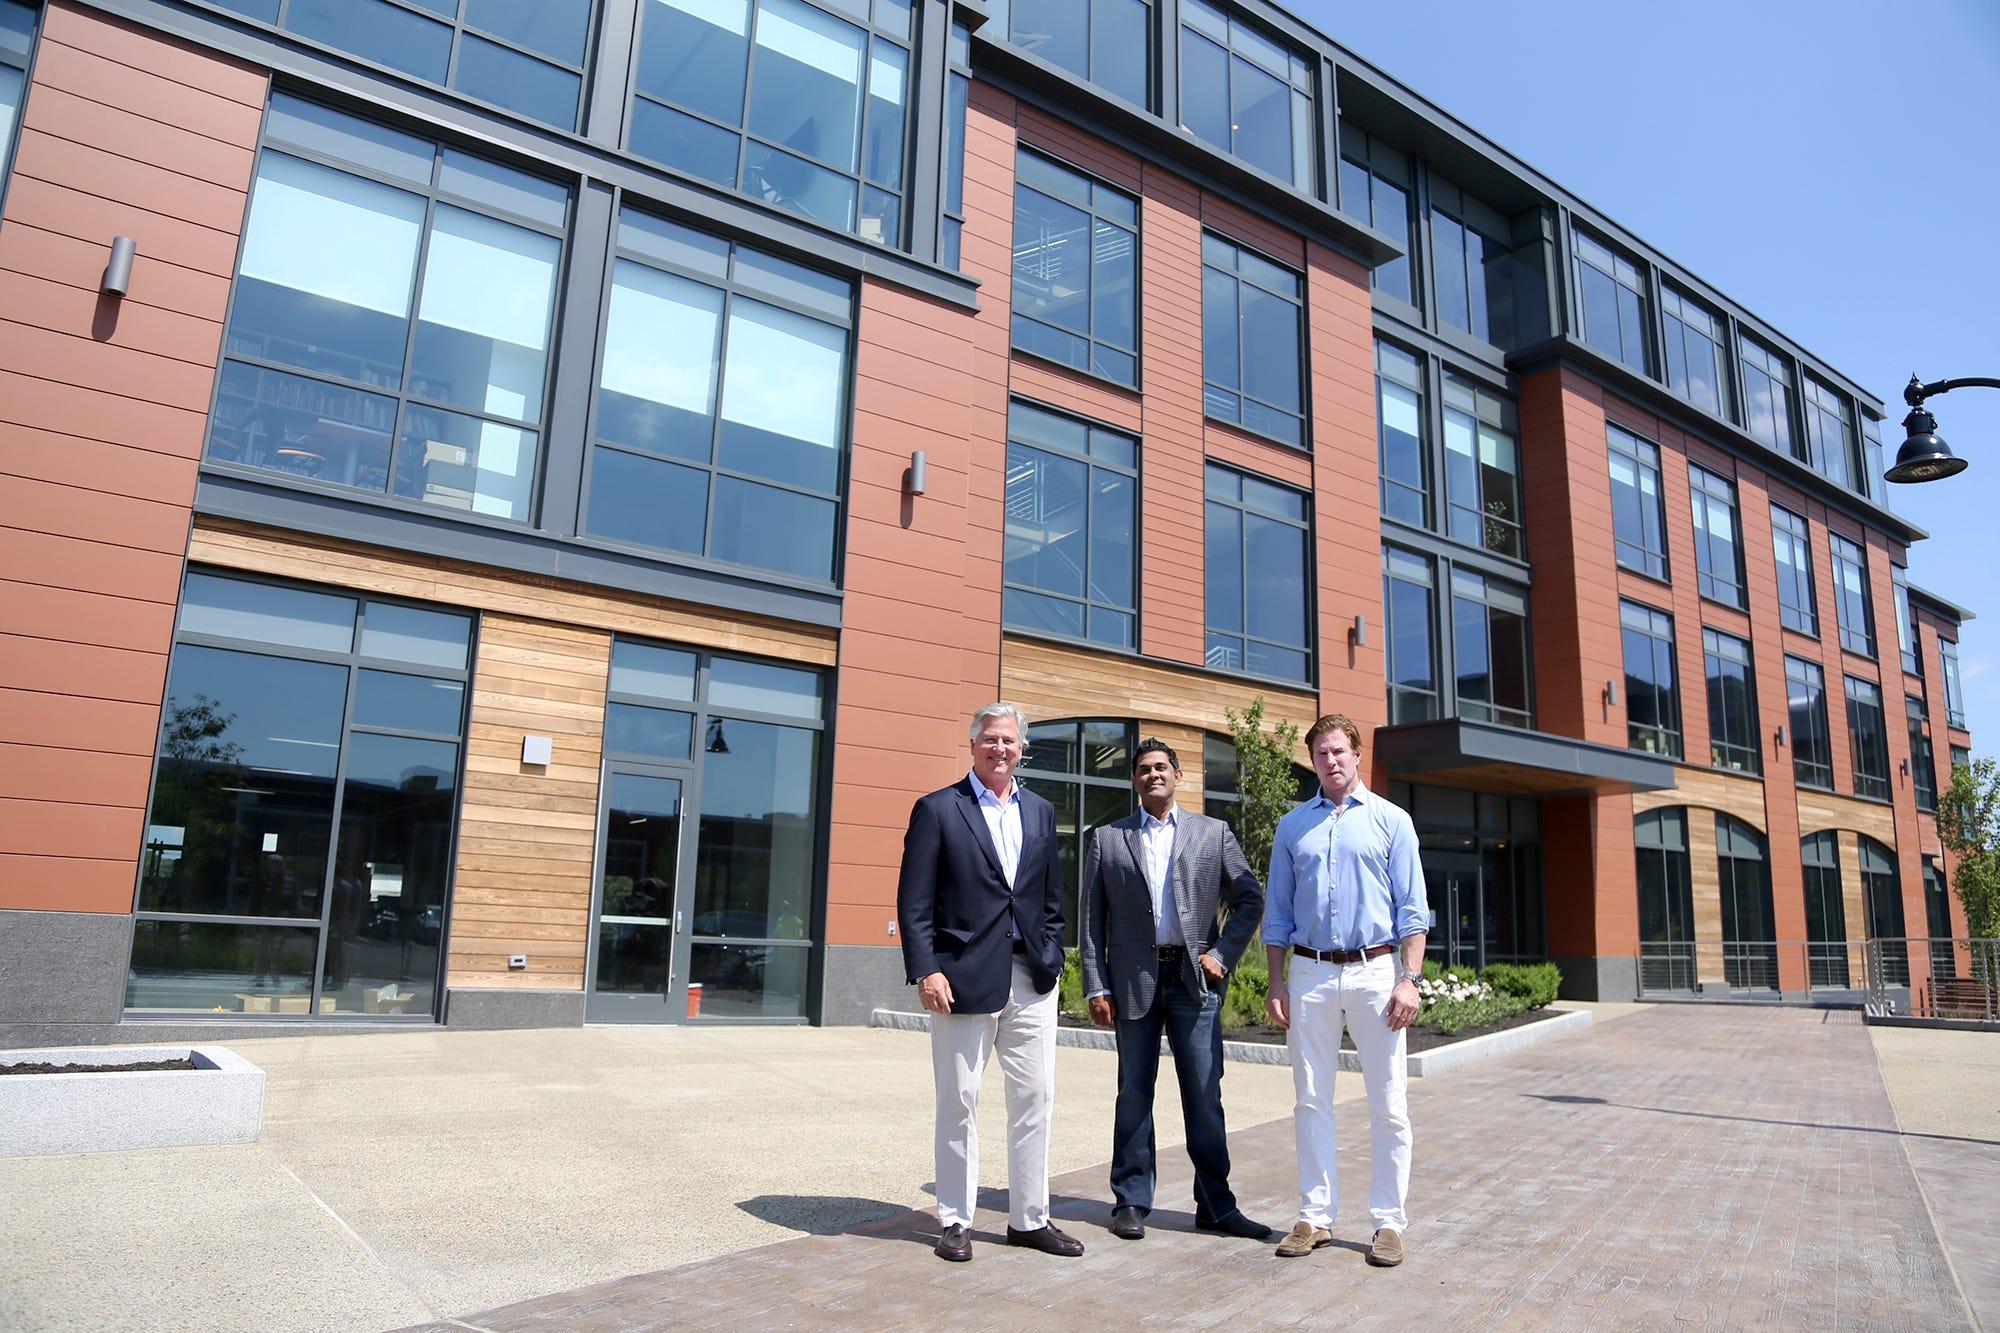 Developer Michael Kane, left, architect Haril Pandya and developer John Kane are making progress on their Maplewood Avenue building in Portsmouth.